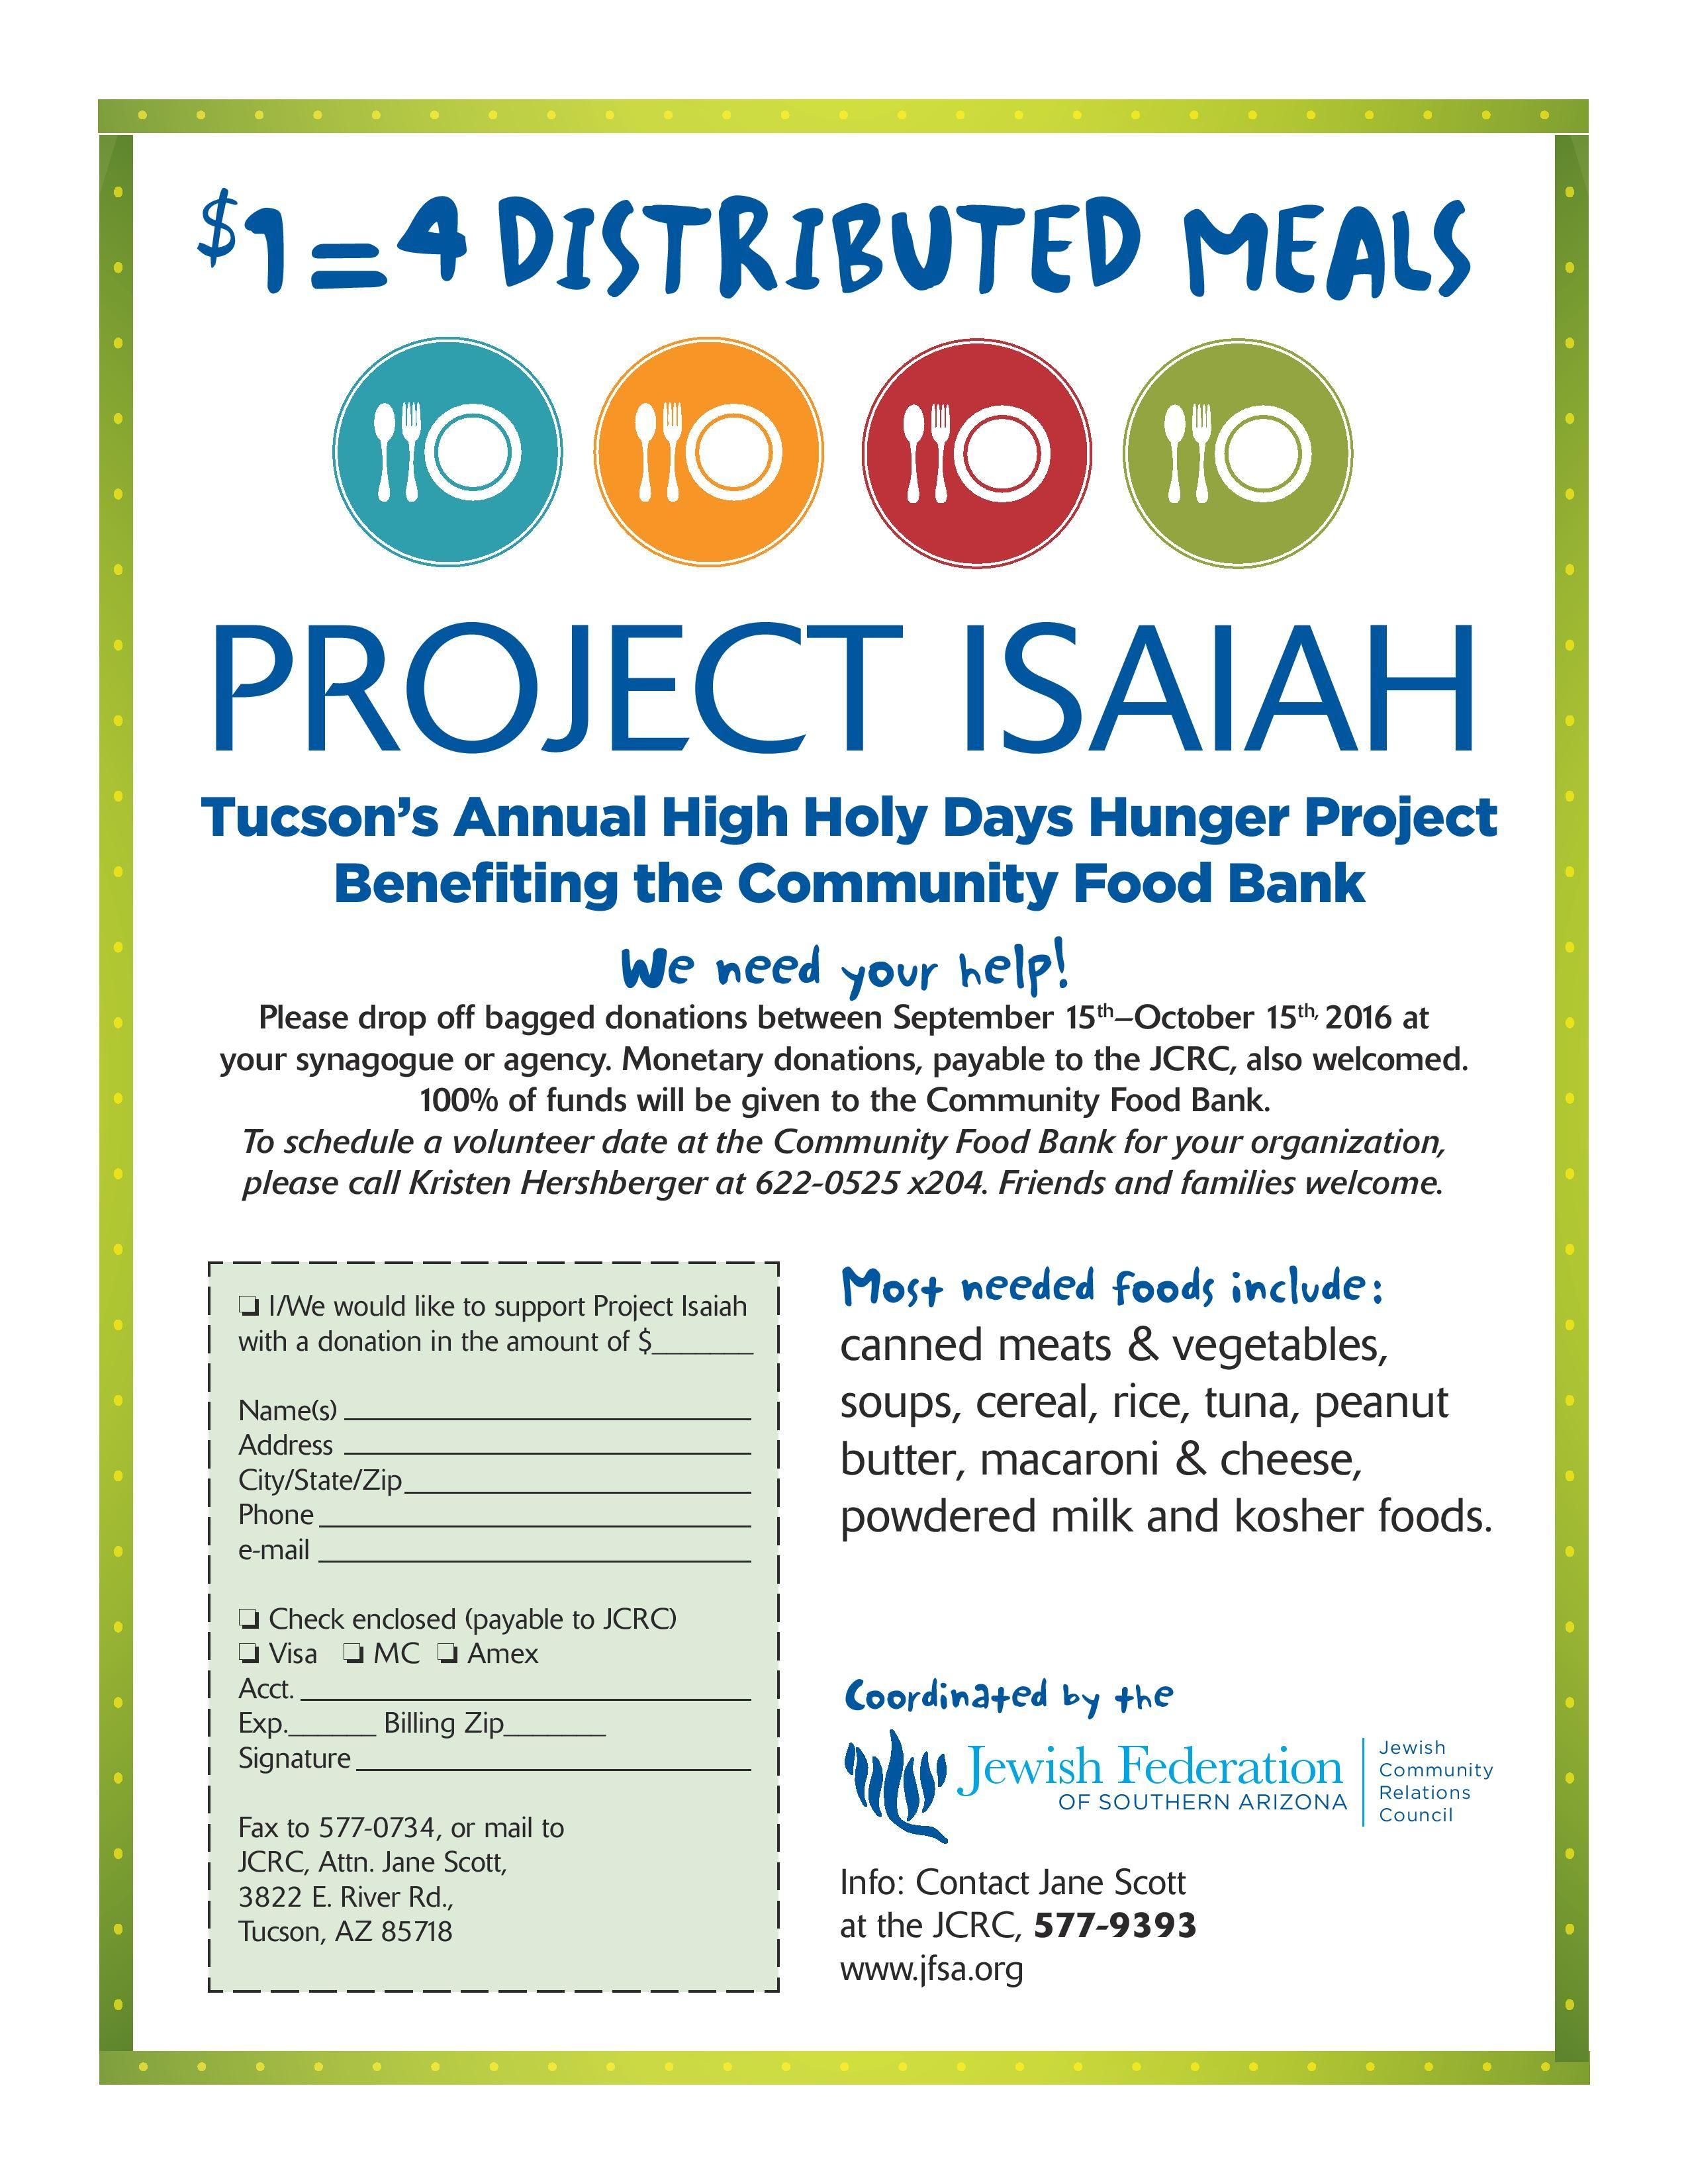 Project  Isaiah @ Synagogues and Agencies